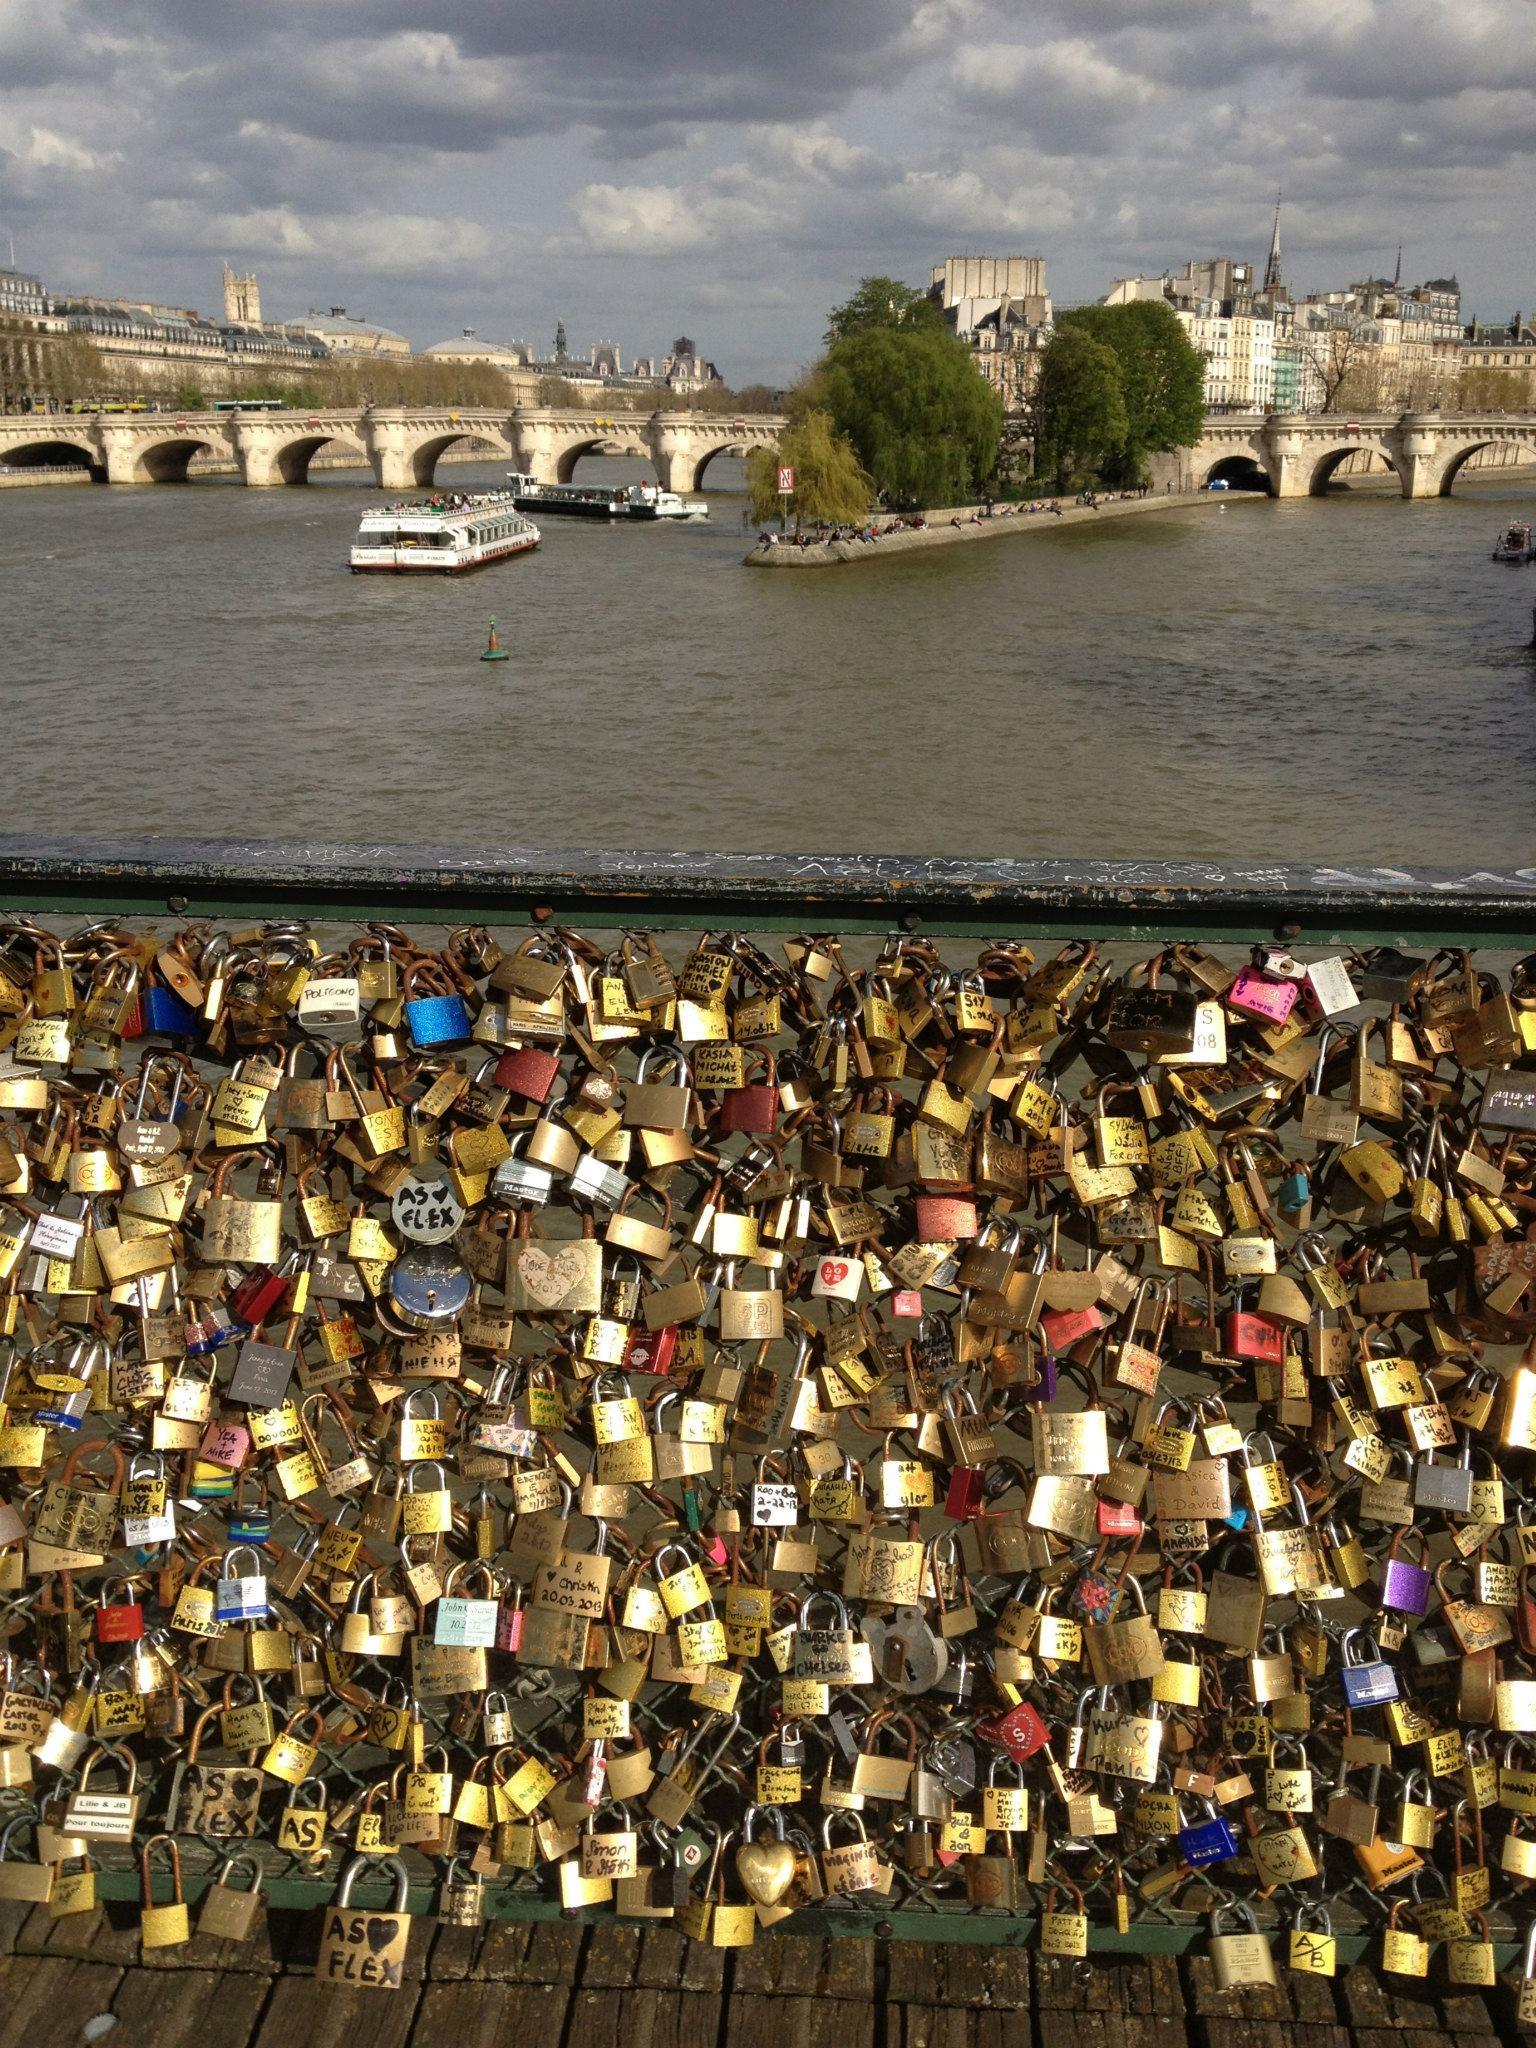 Image 10 of Love Lock Bridge Proposal in Paris